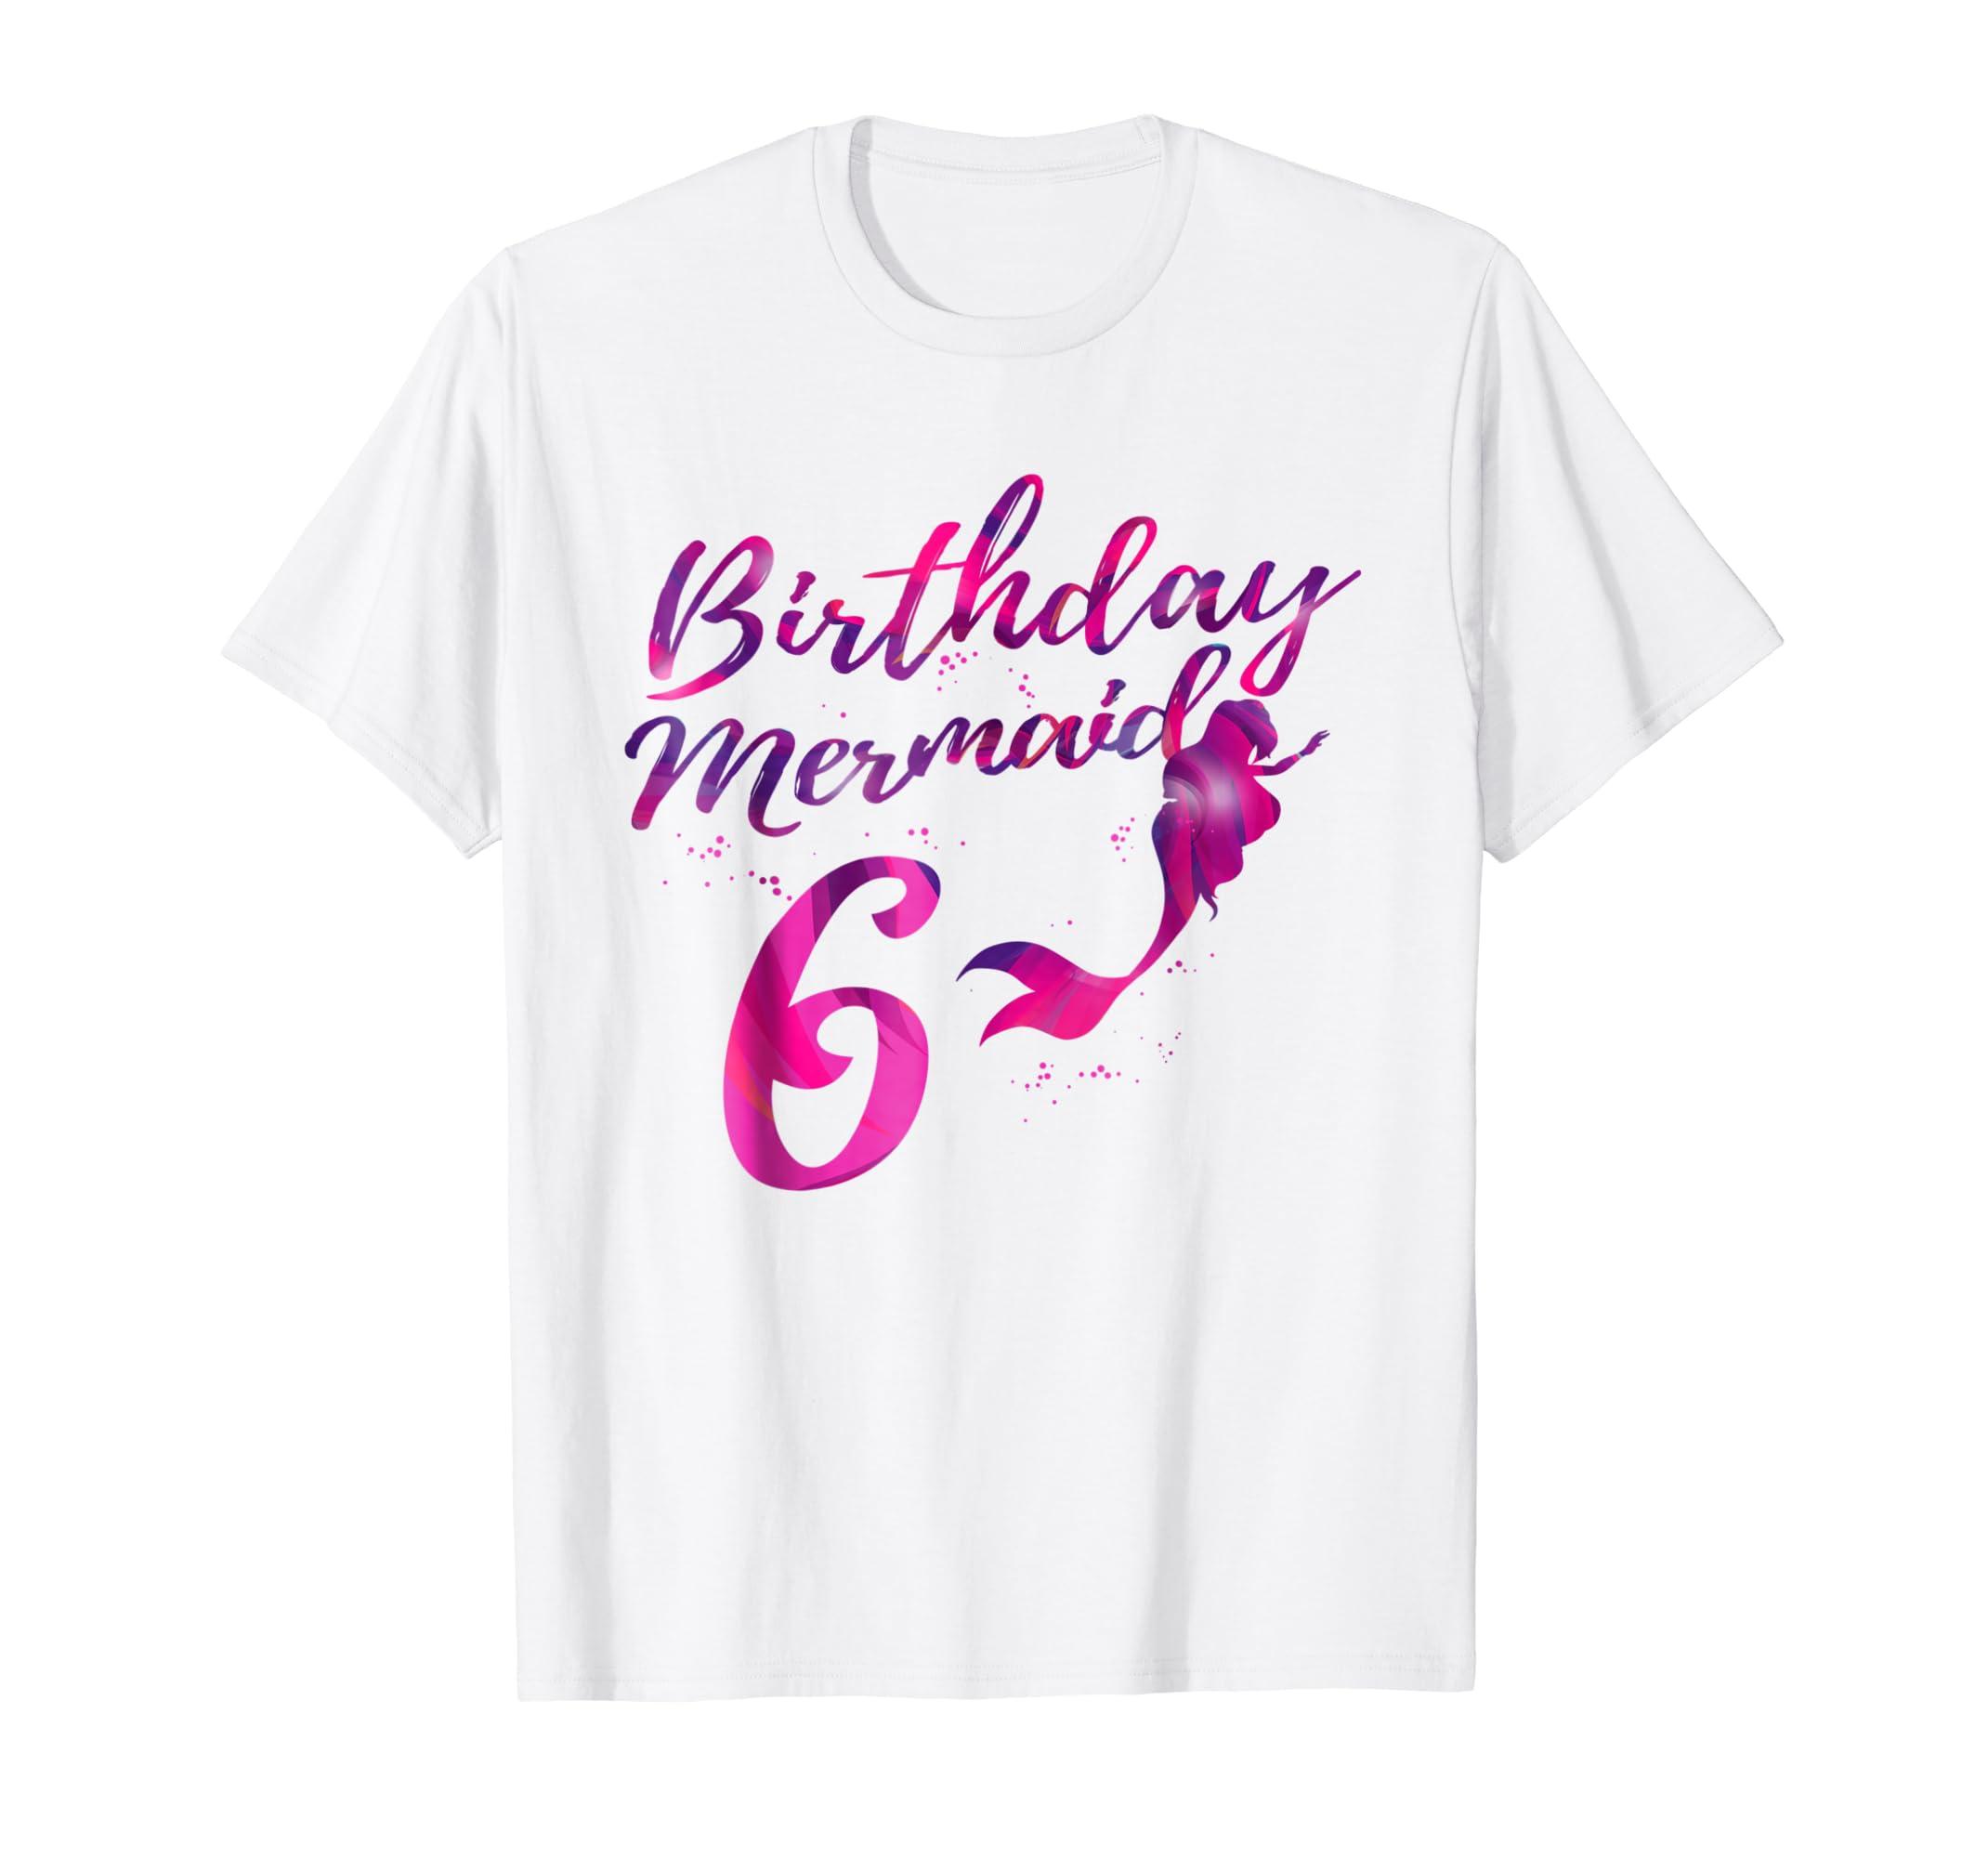 Amazon Mermaid Birthday Shirt 6 Year Old Girl Gift Clothing